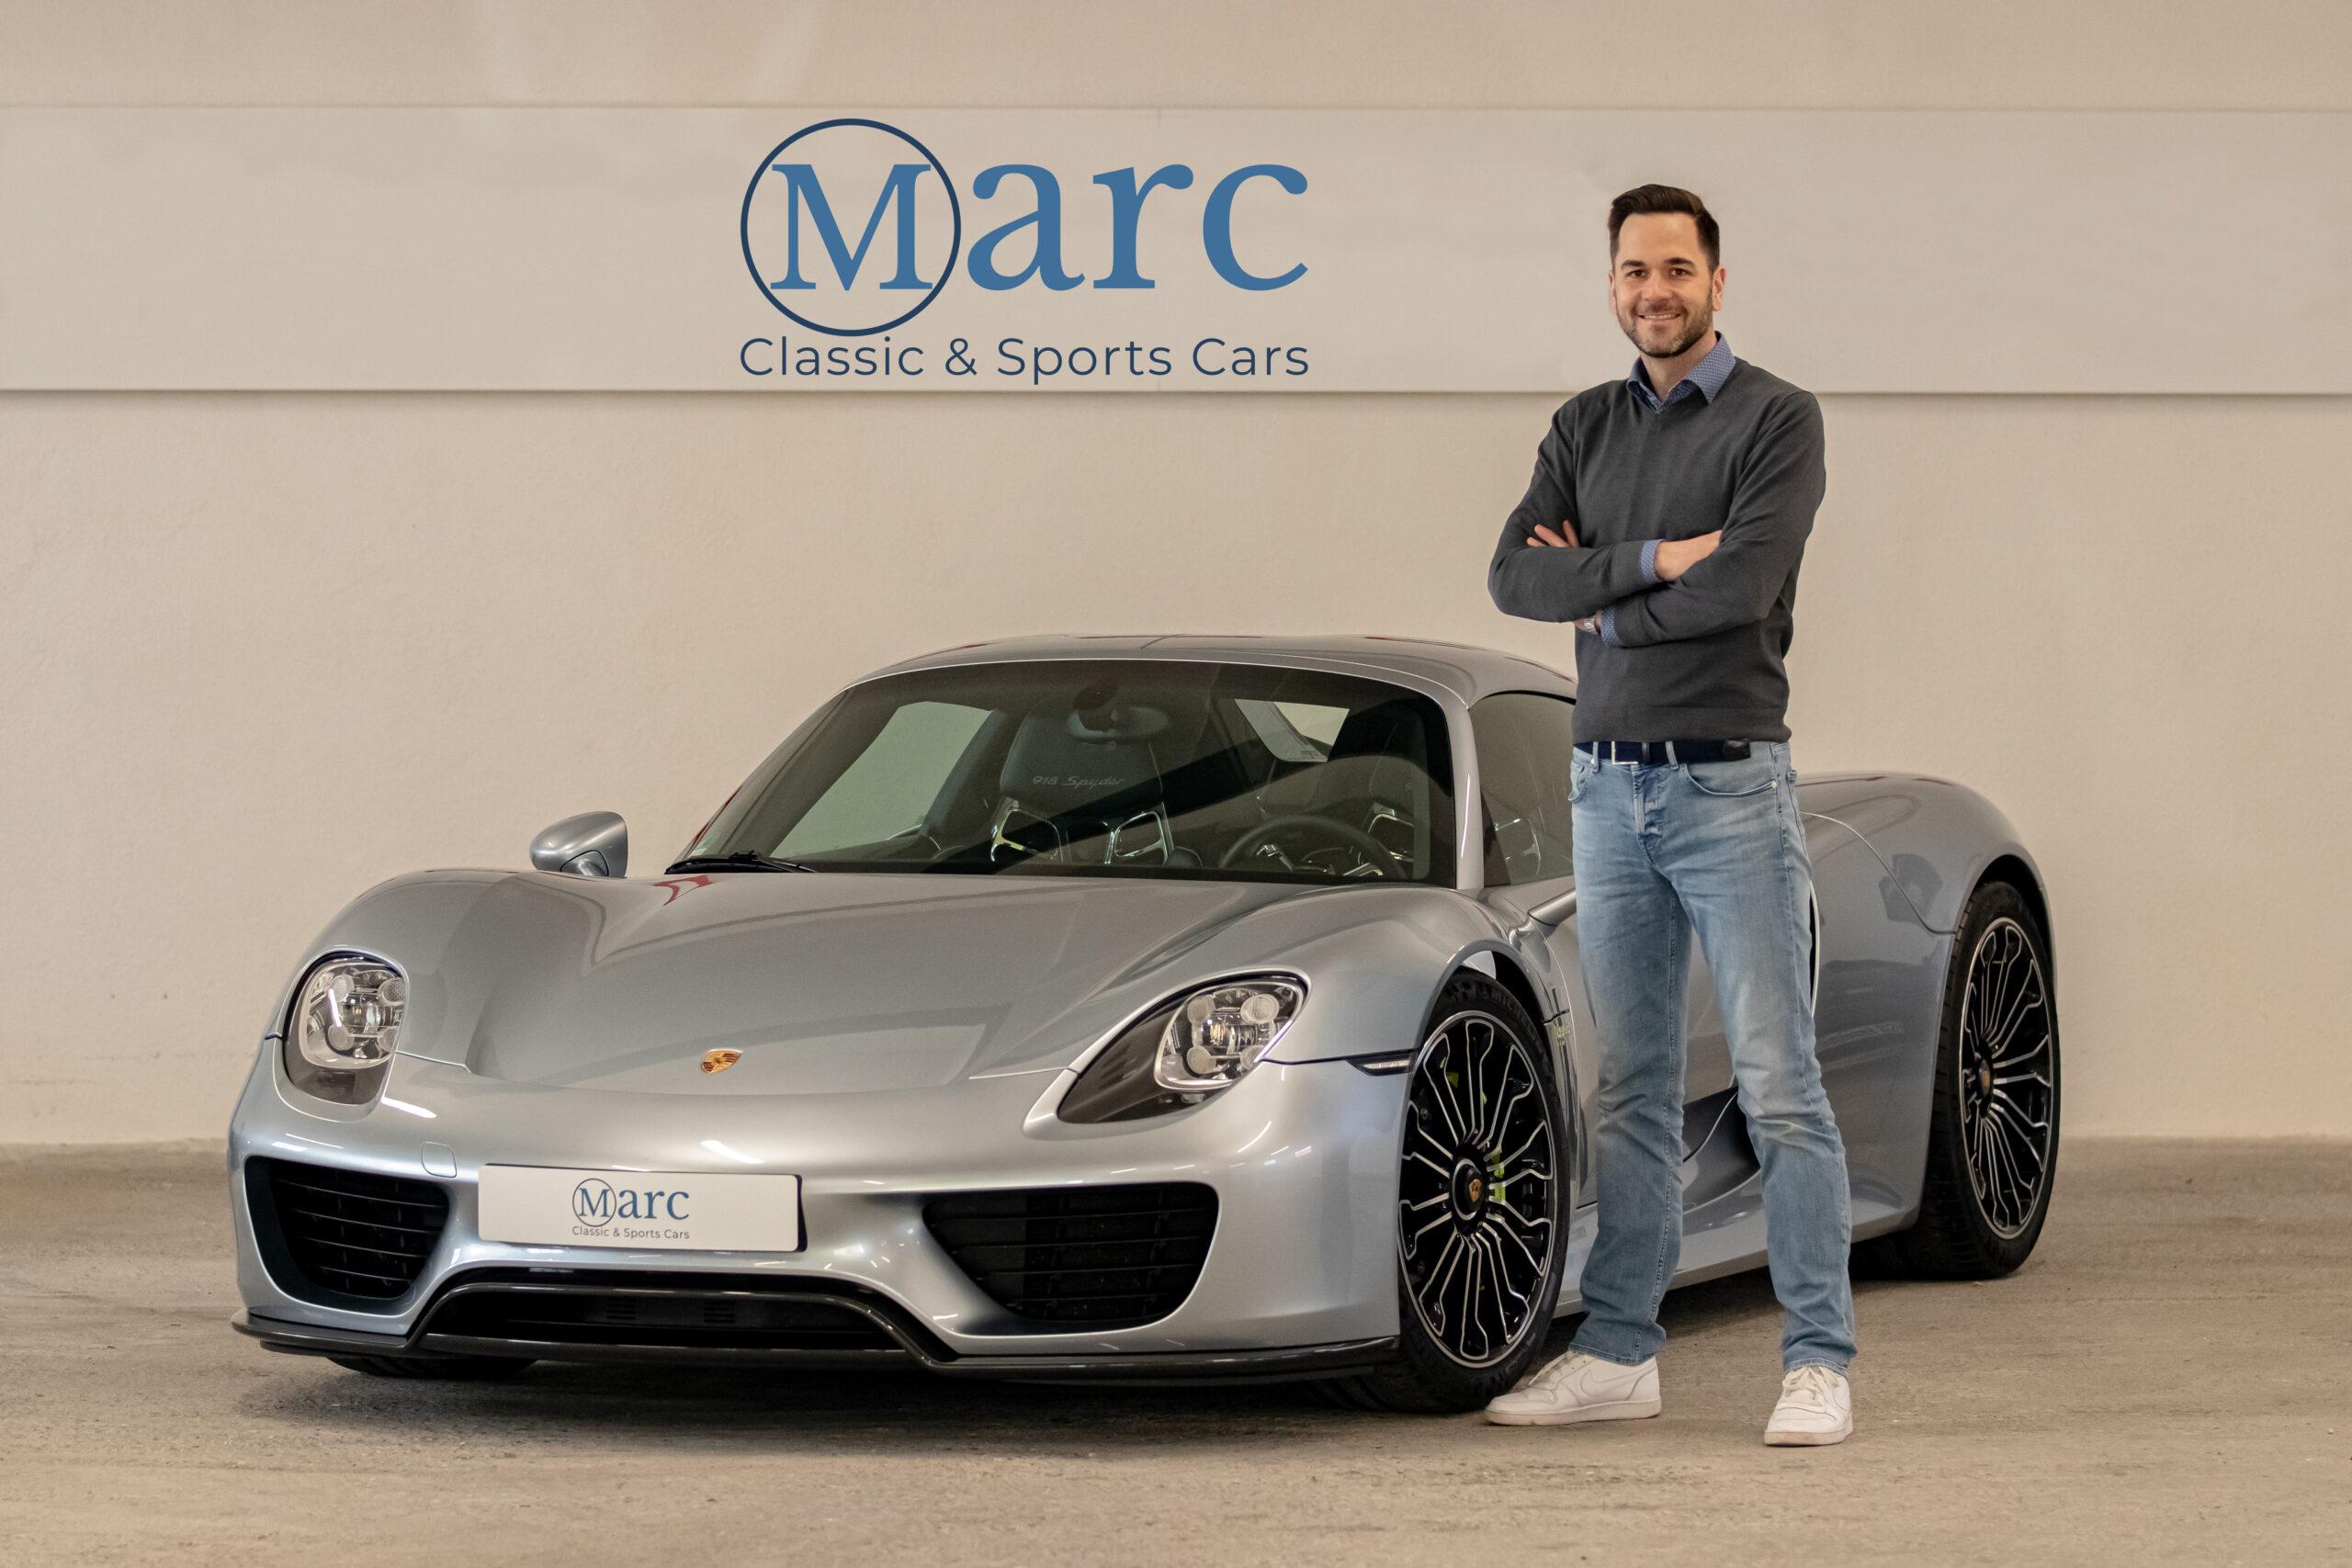 MARC Classic & Sports Cars